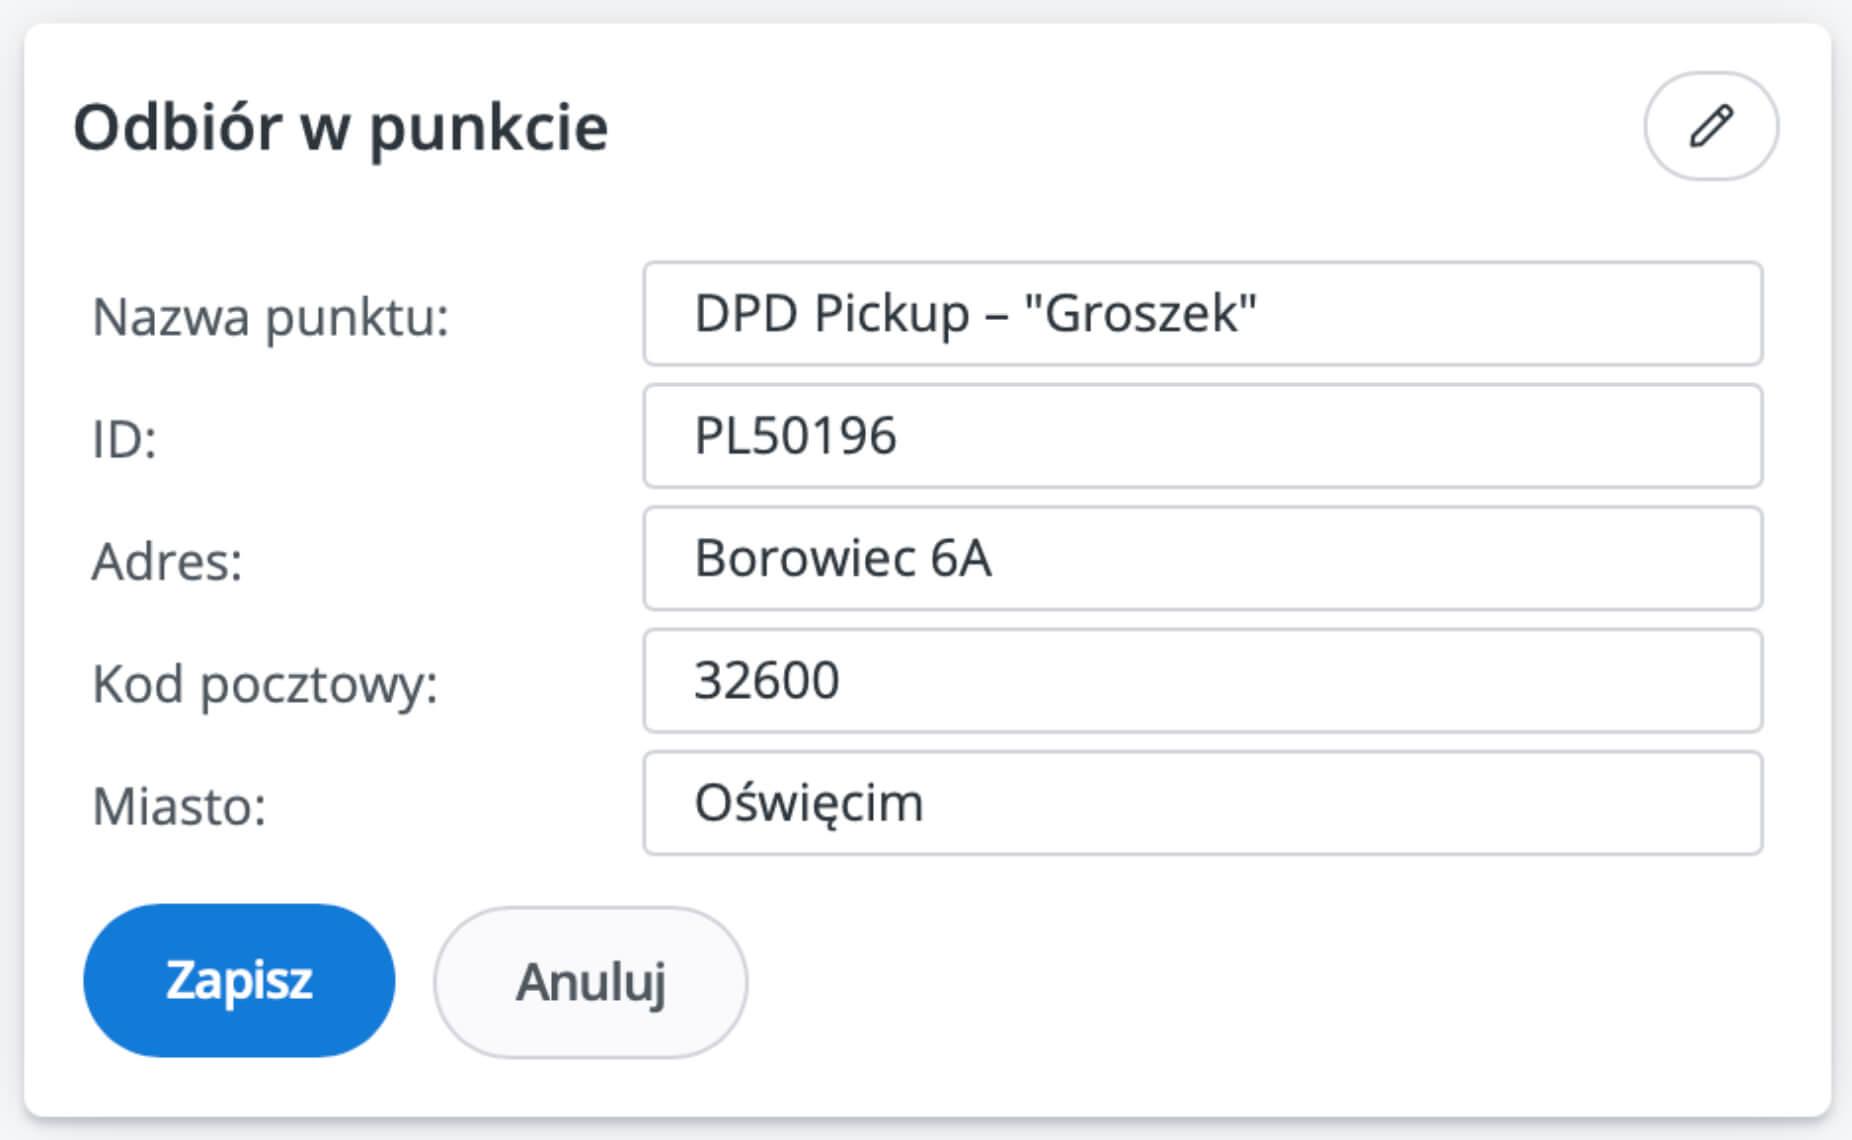 DPD WooCommerce DPD Pickup Baselinker